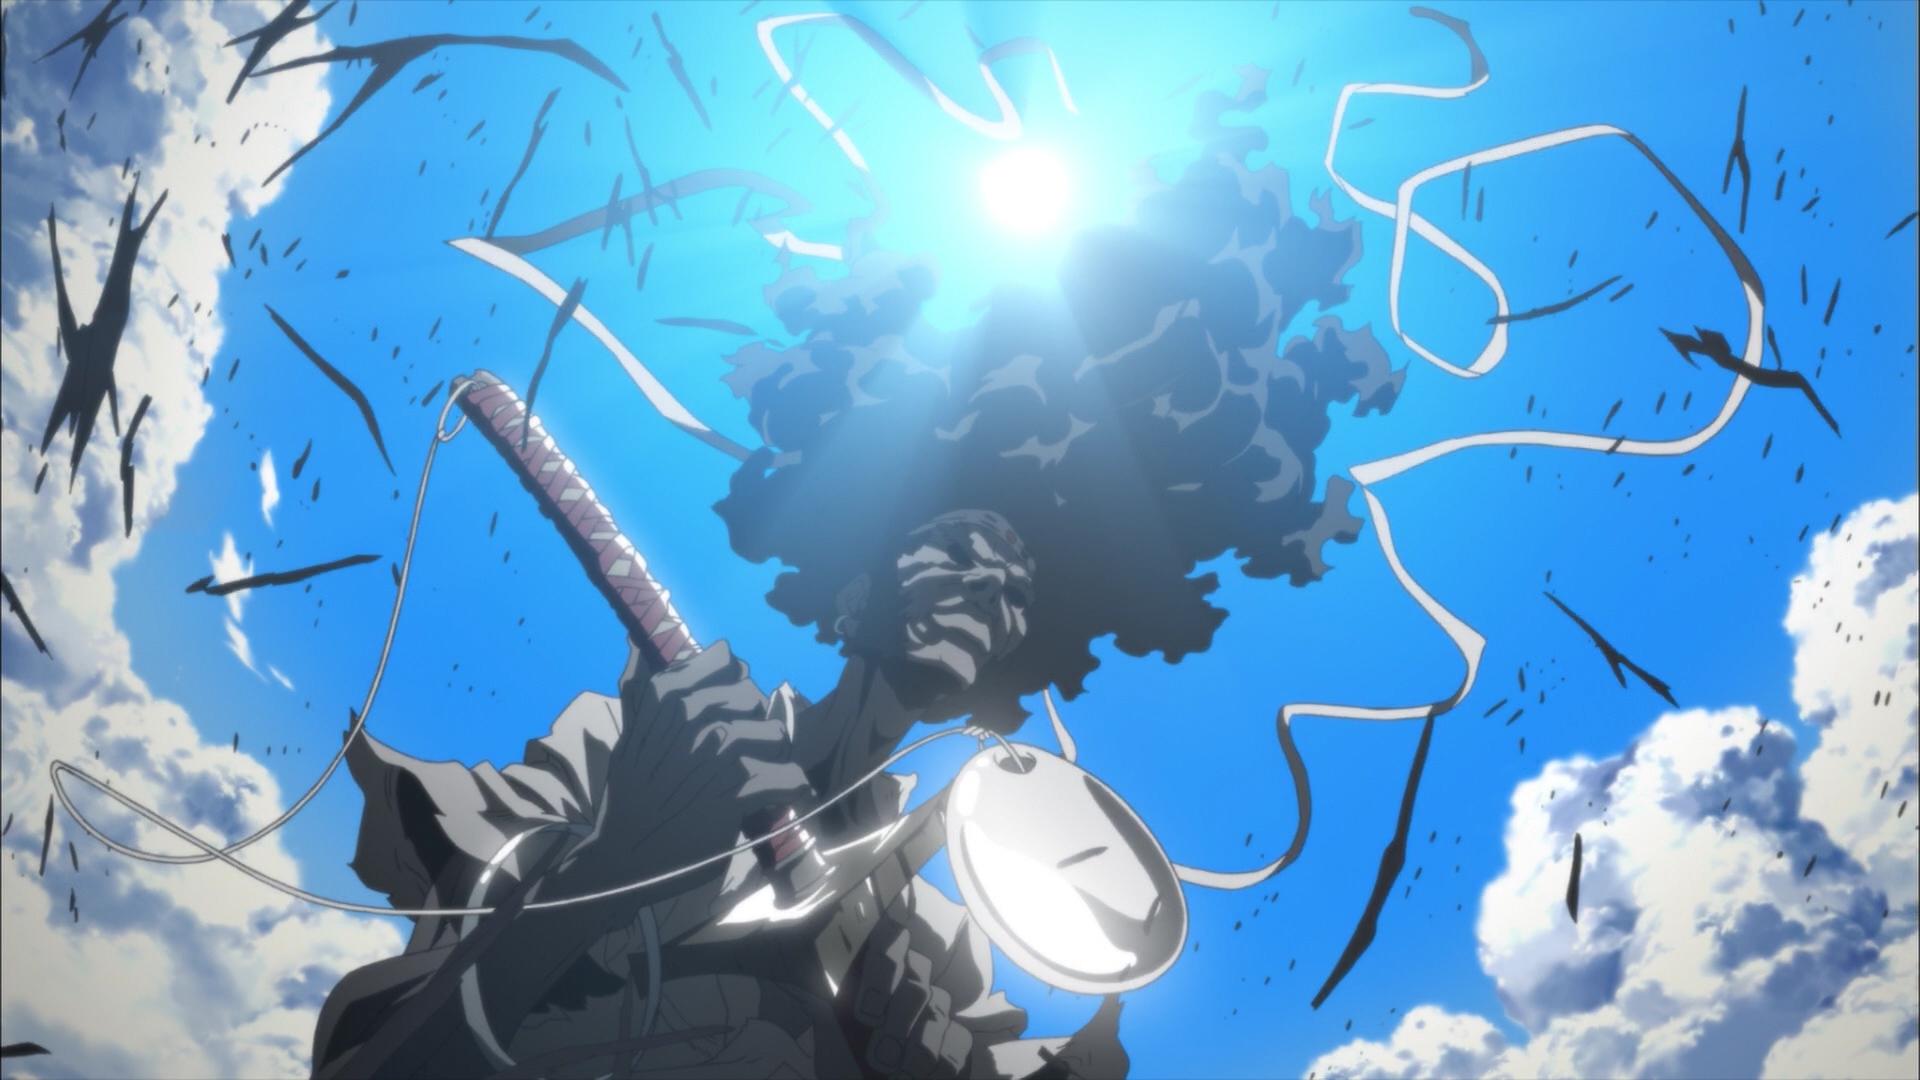 Afro Samurai Anime Game N Wallpaper 1920x1080 91895